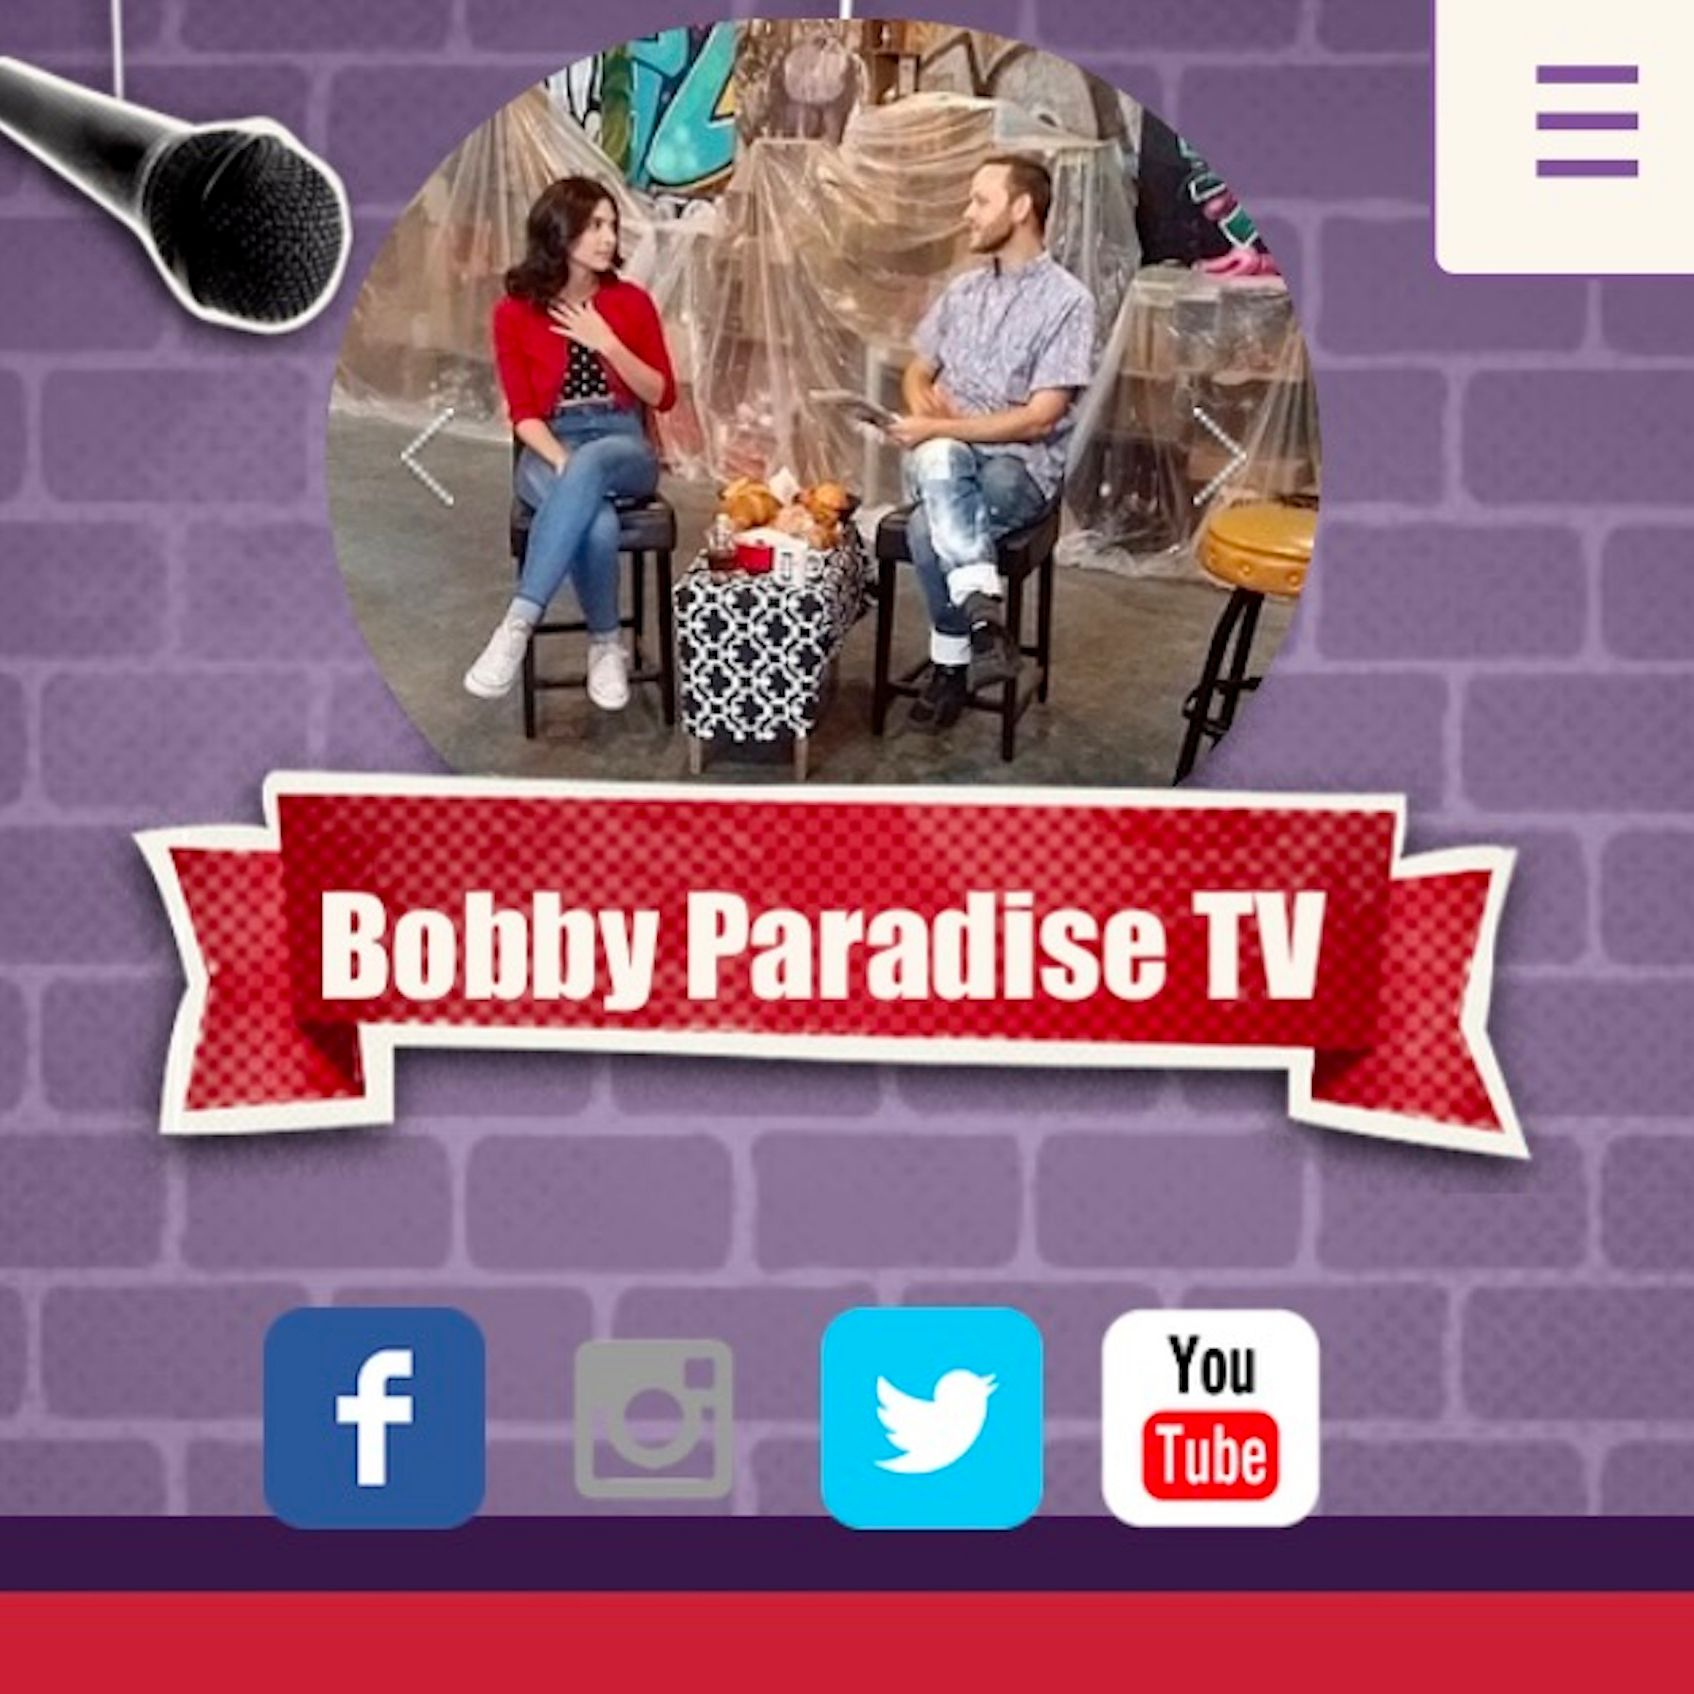 Bobby Paradise TV